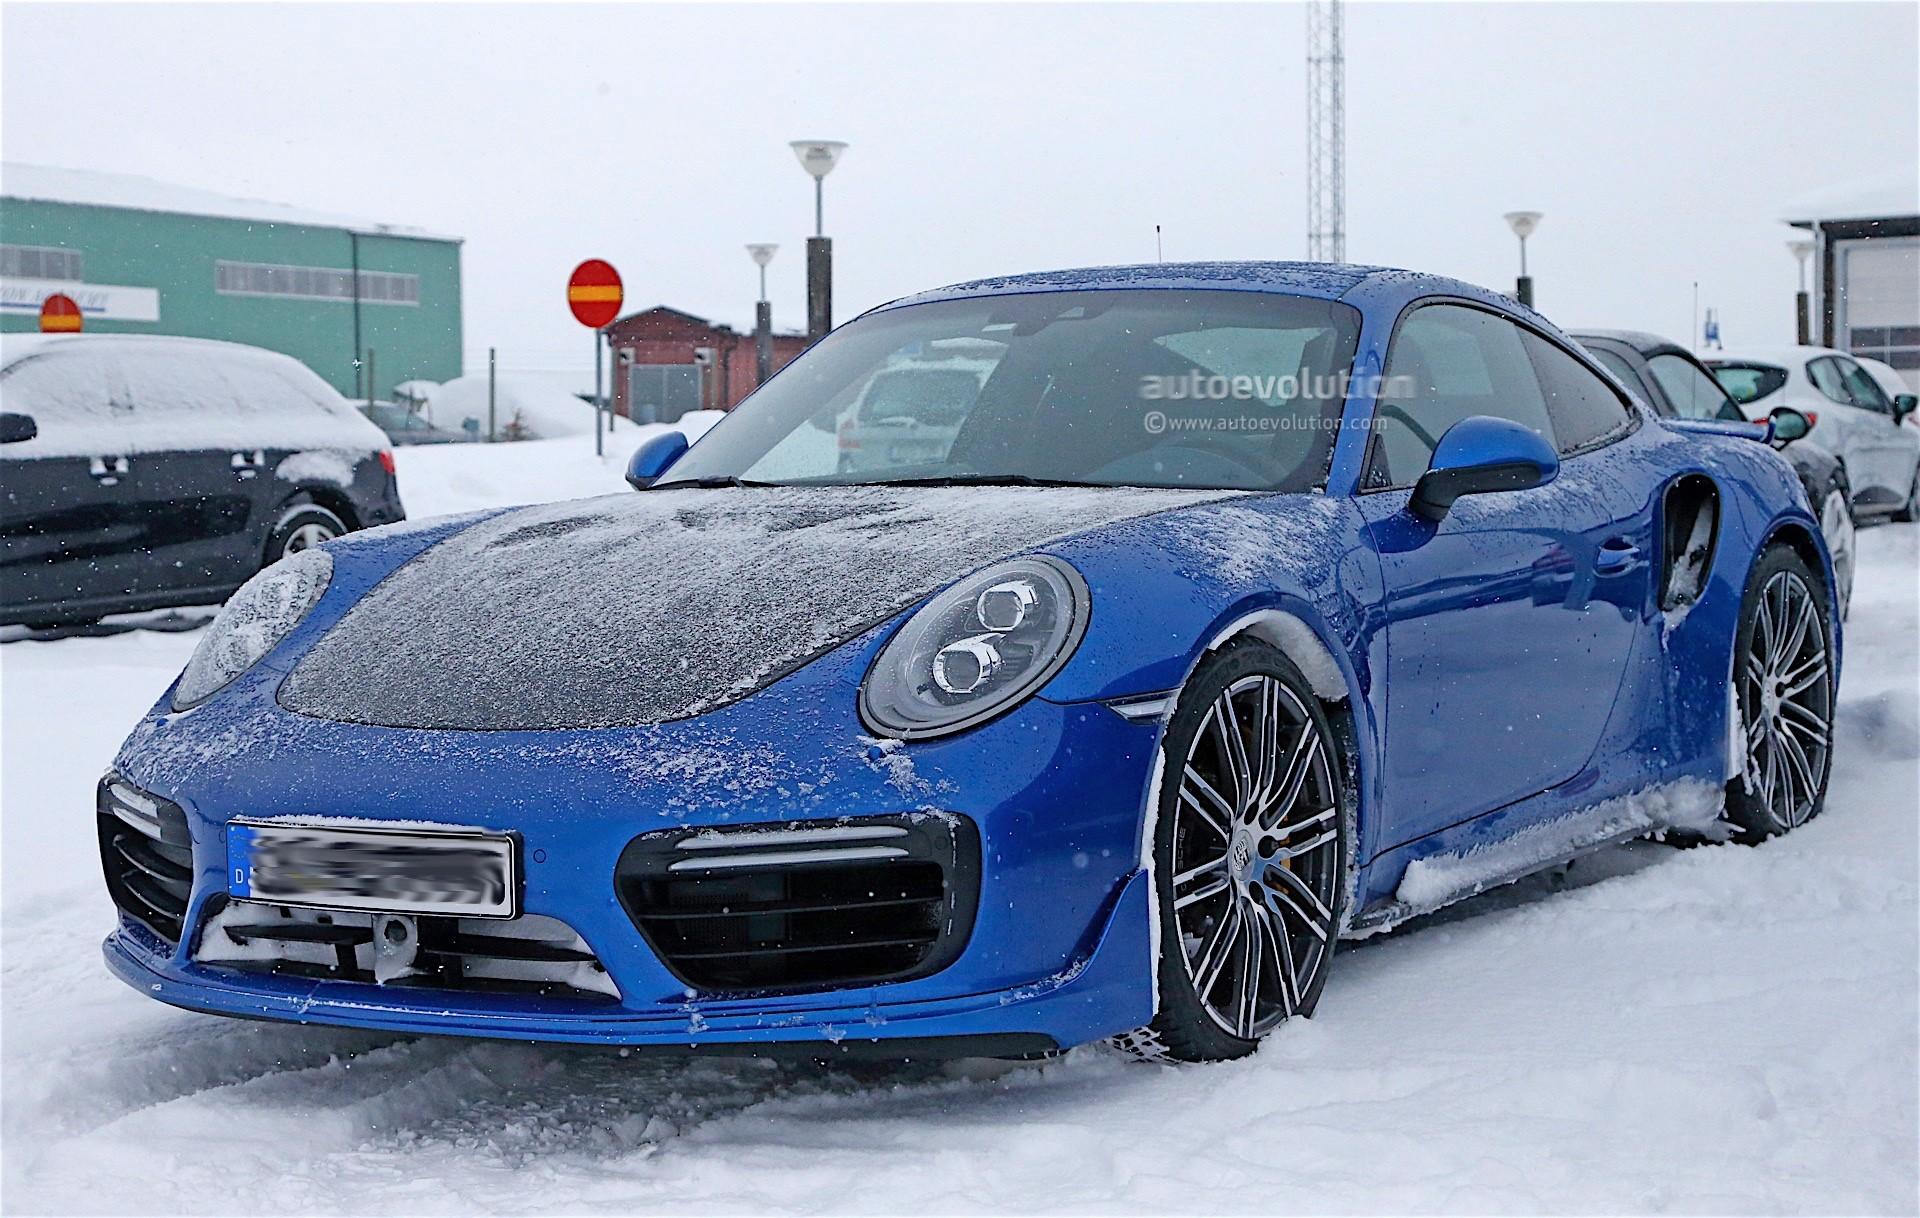 porsche-911-gt2-what-we-know-so-far_4 Stunning 2008 Porsche 911 Gt2 Horsepower Cars Trend